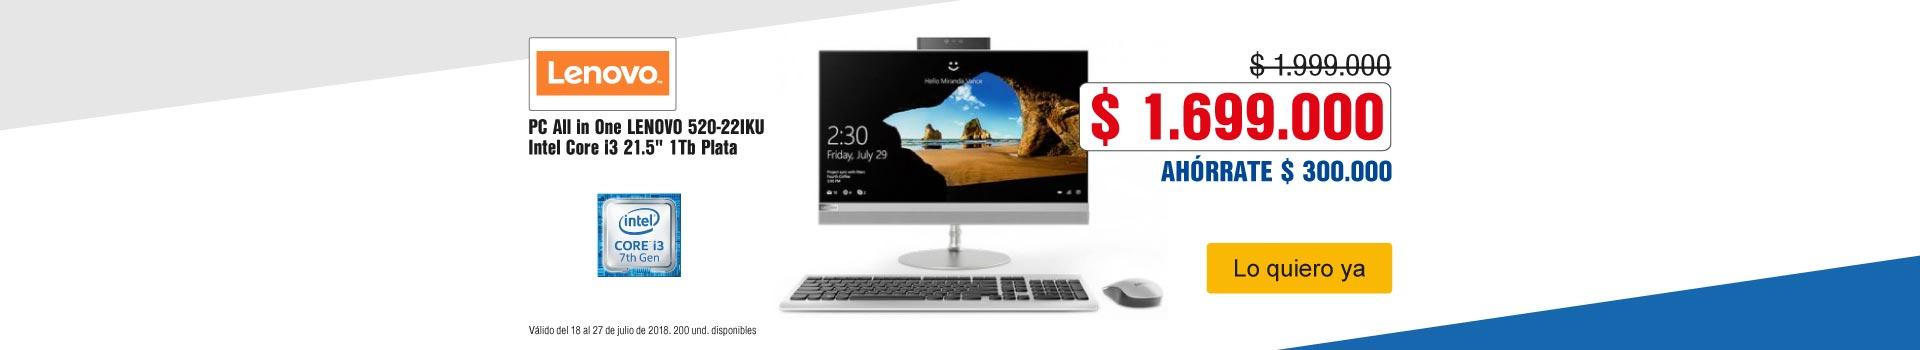 AK-KT-BCAT-2-computadores y tablets-PP---Lenovo-AIO 520-22IKU-Jul21